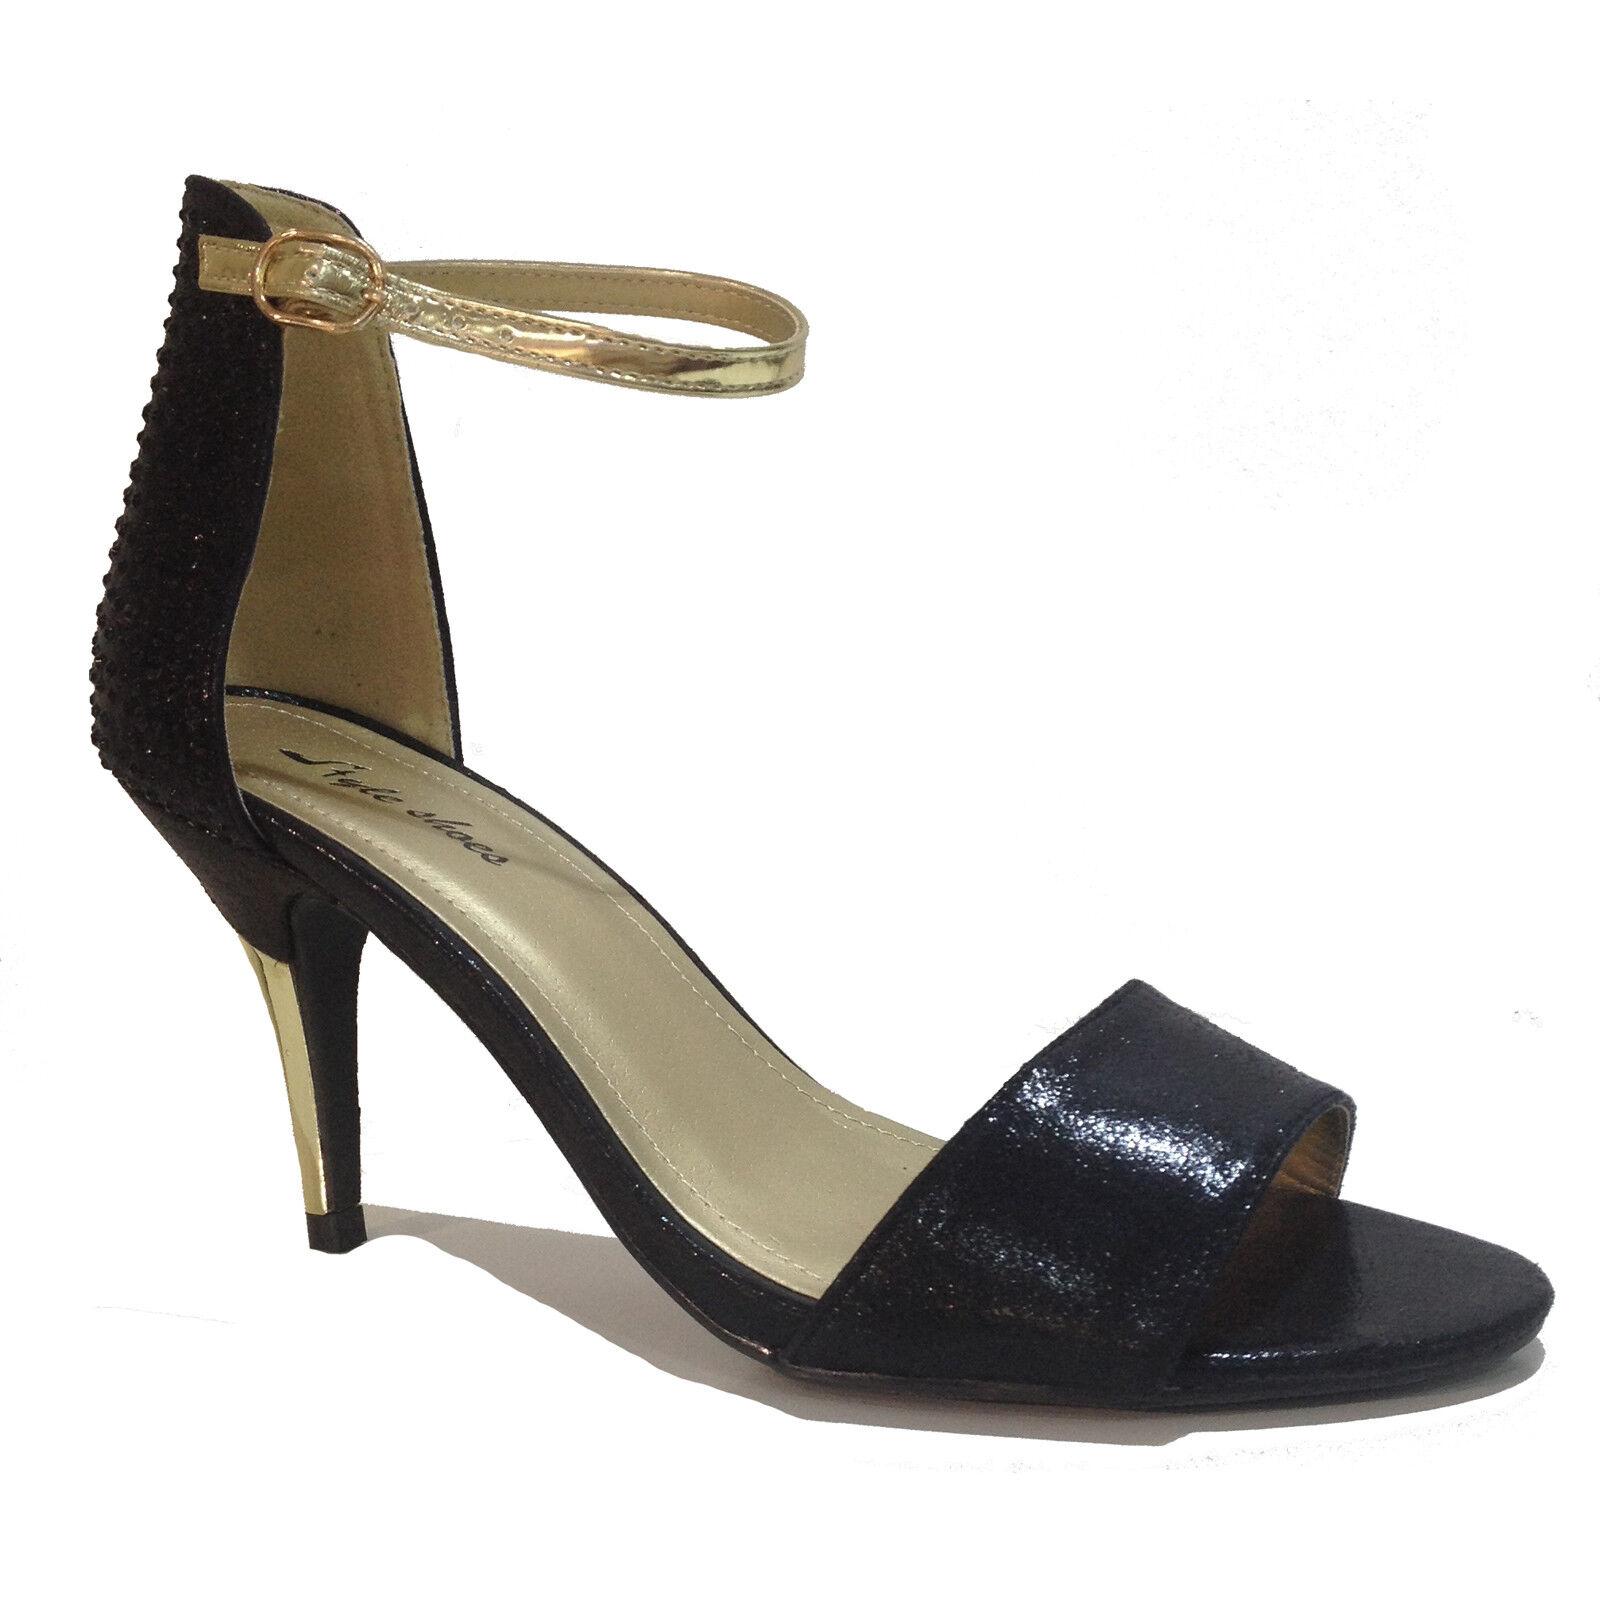 ☼ELEN☼ Sandales à talon - STYLE schuhe - Ref  0373